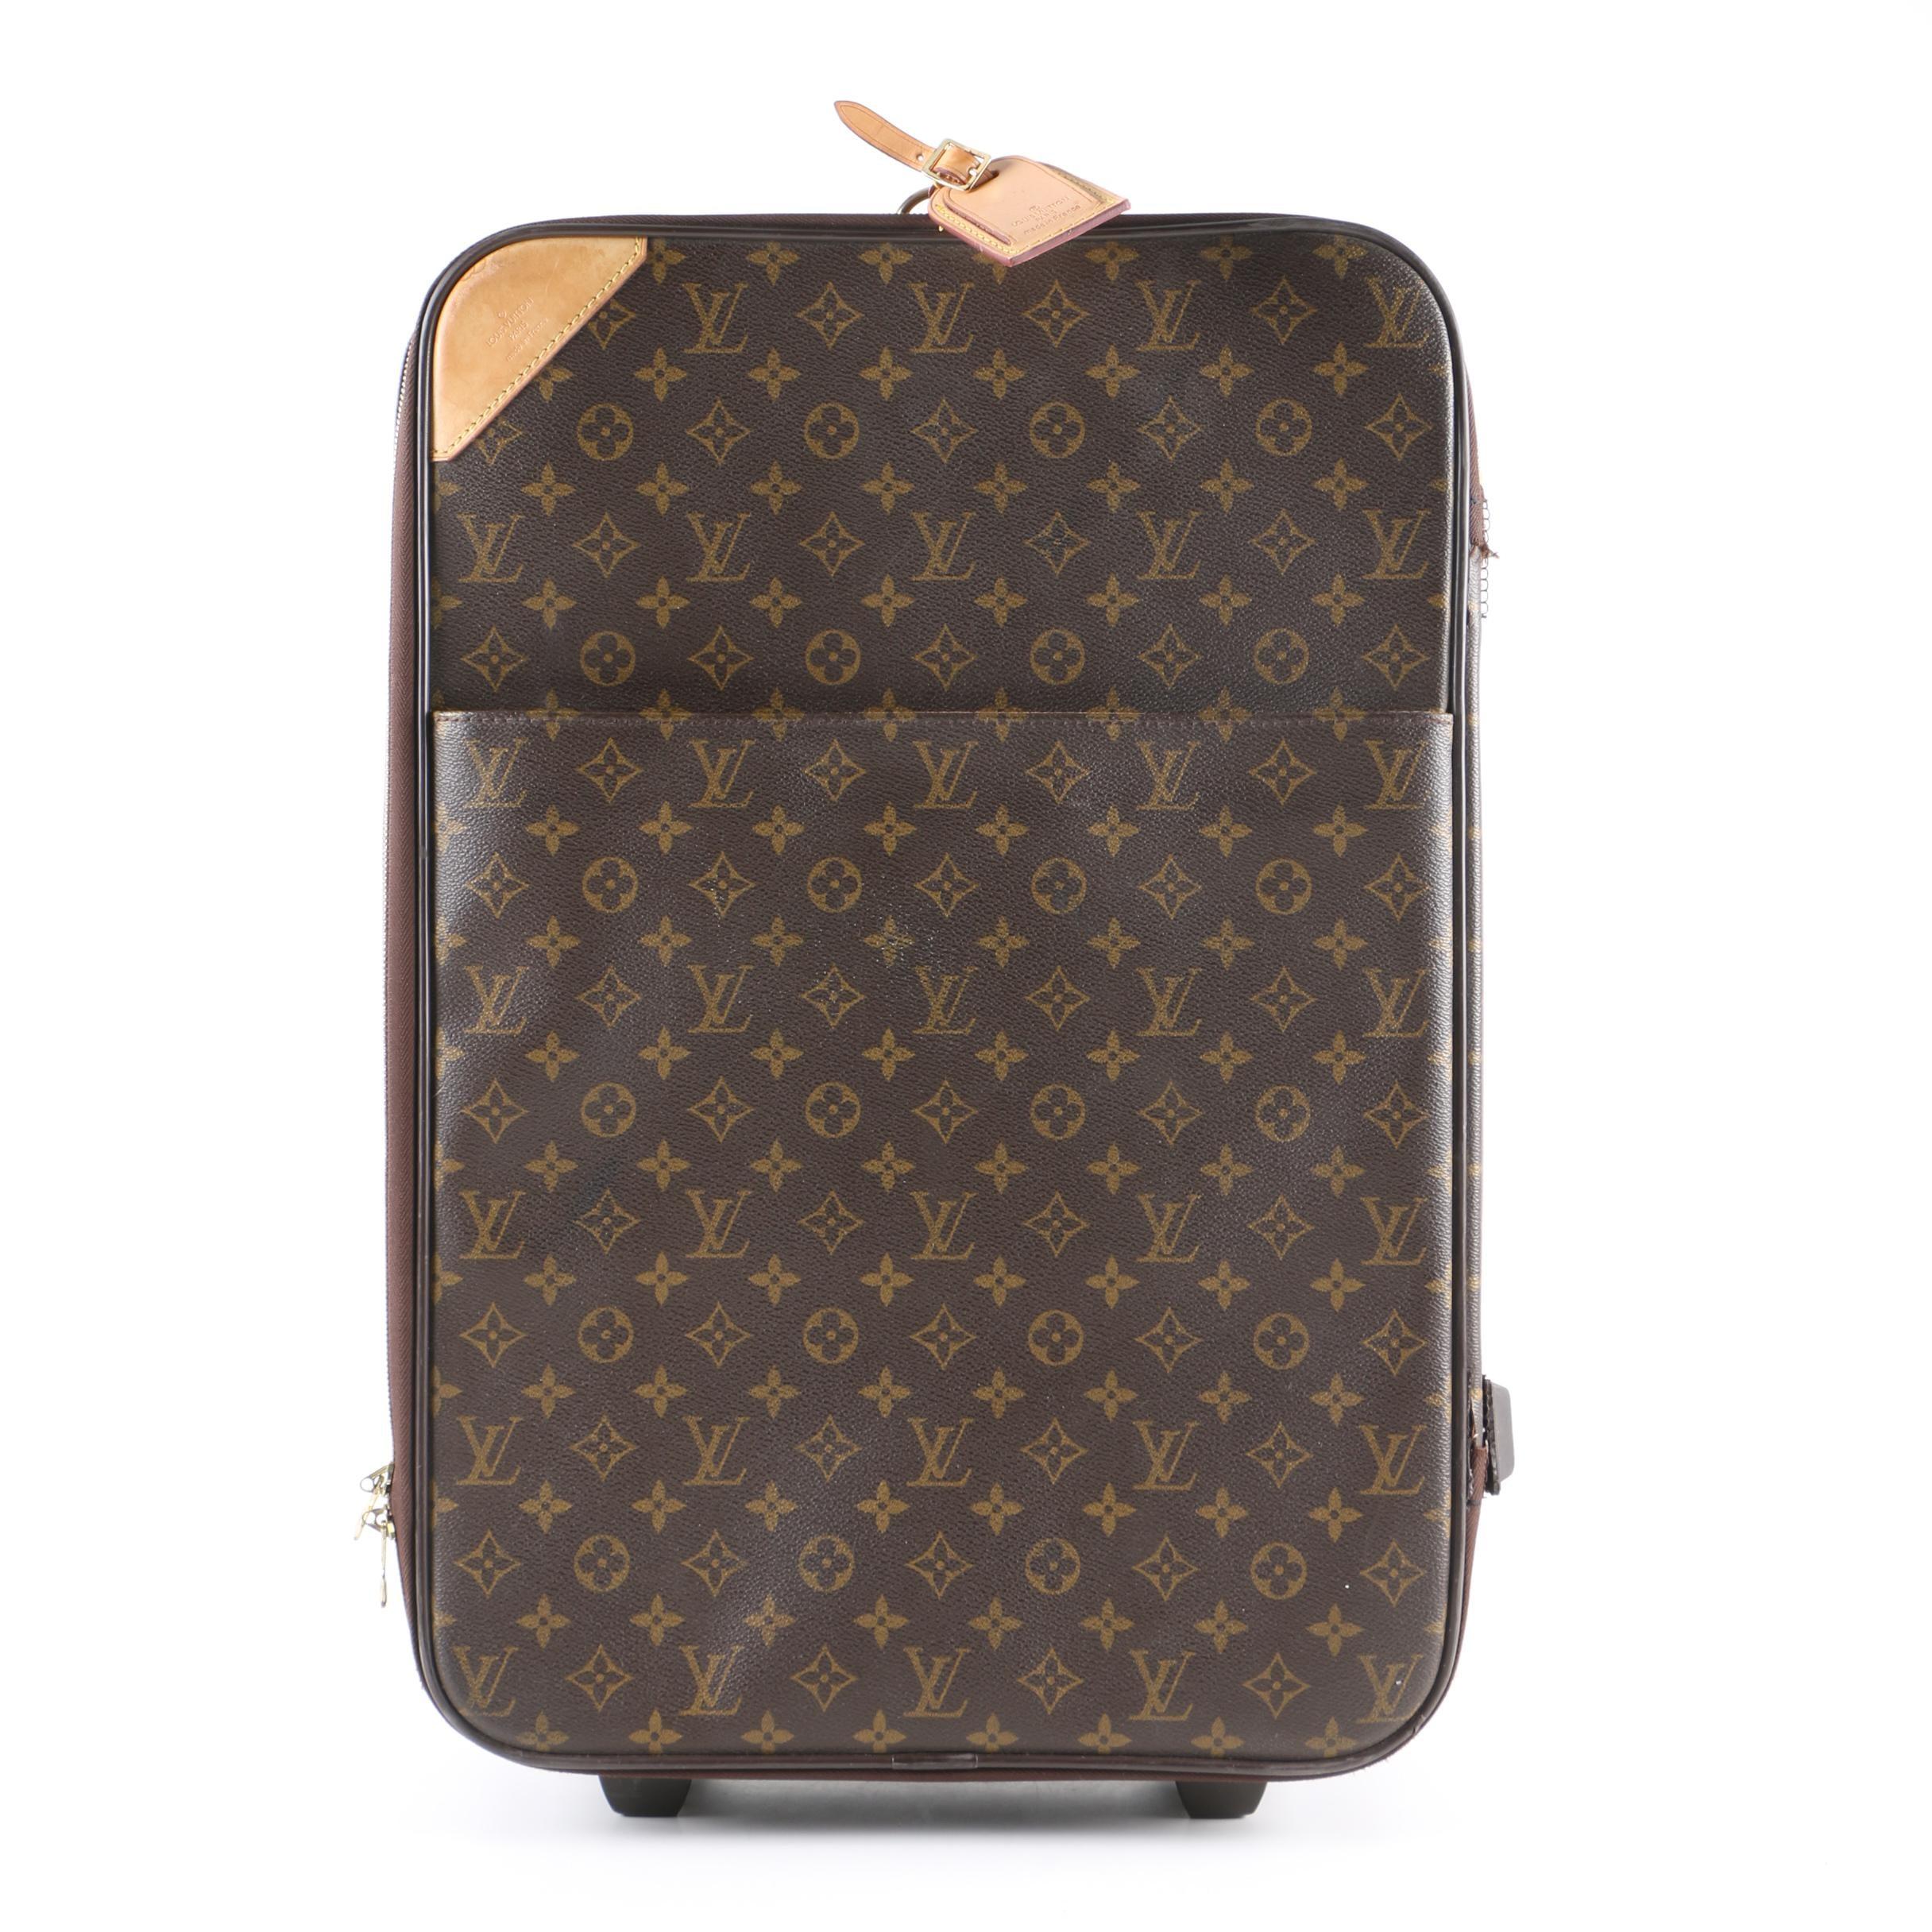 Louis Vuitton of Paris Monogram Coated Canvas Rolling Suitcase